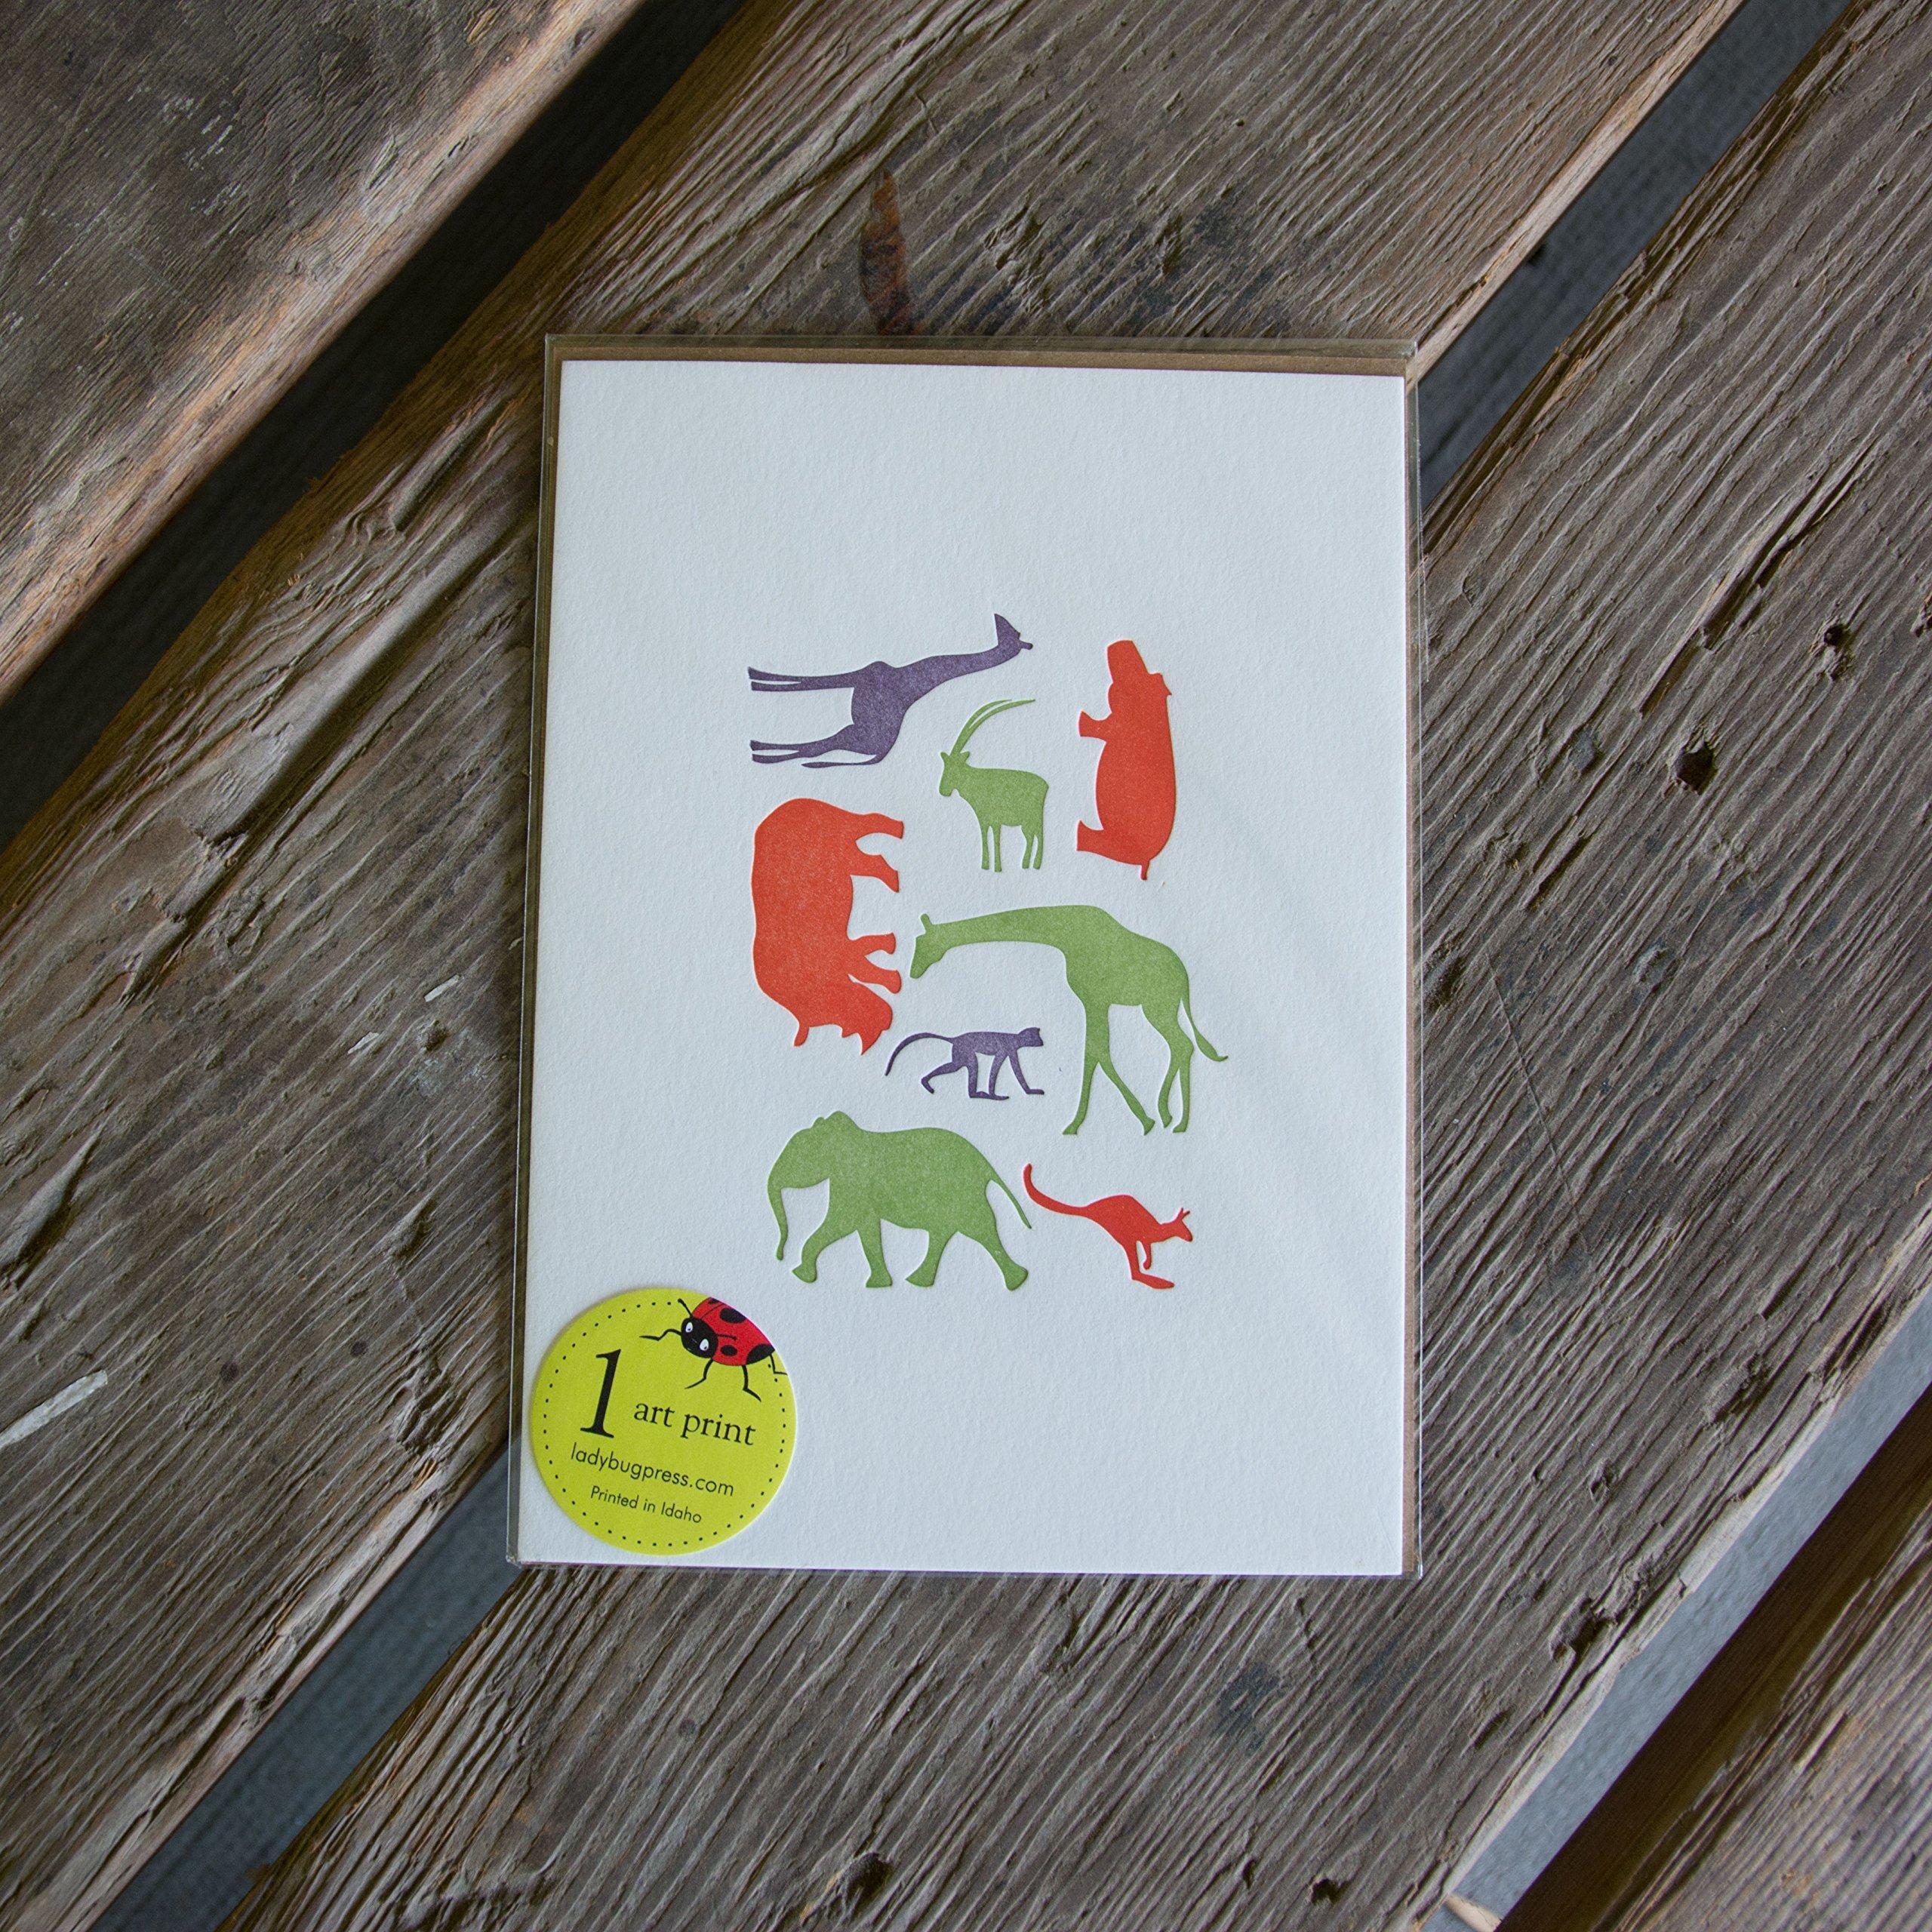 Animal Zoo Print, letterpress printed, eco-friendly, art print